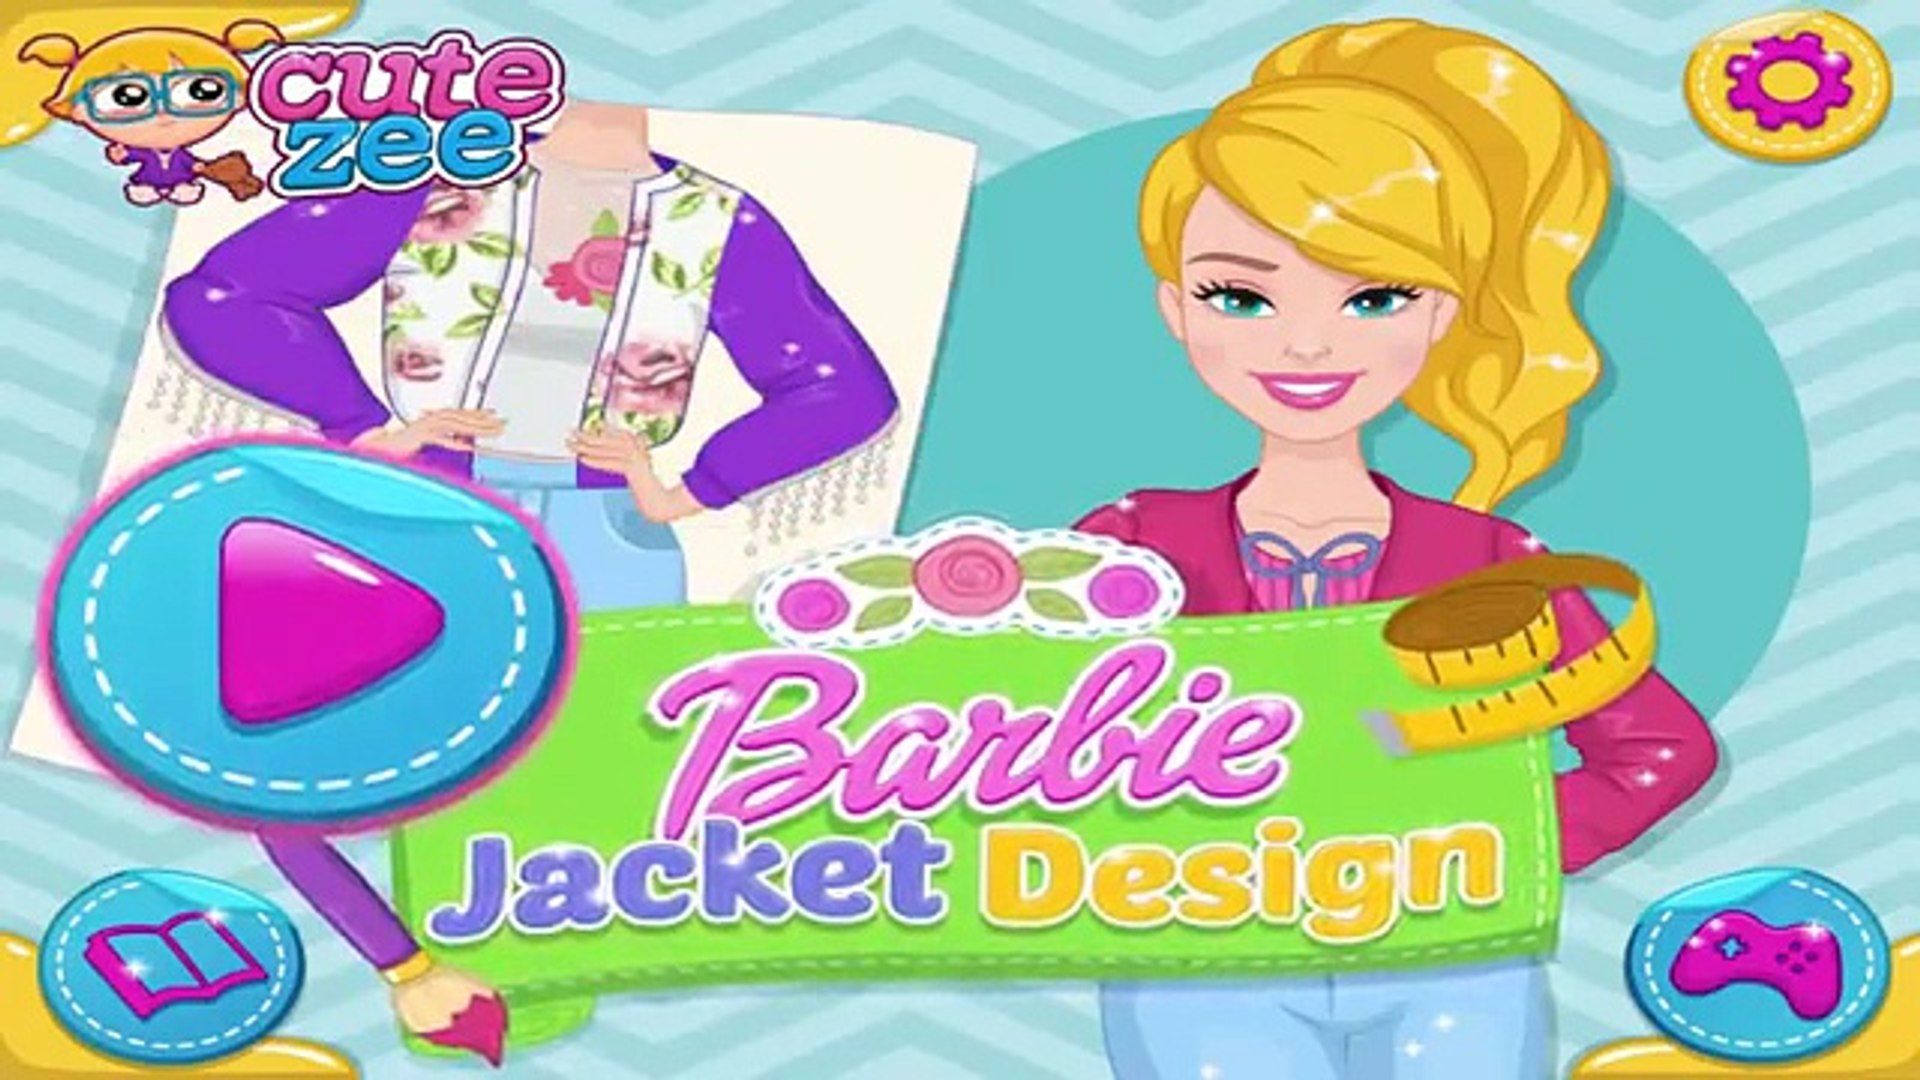 Barbie - Barbie Jacket Design